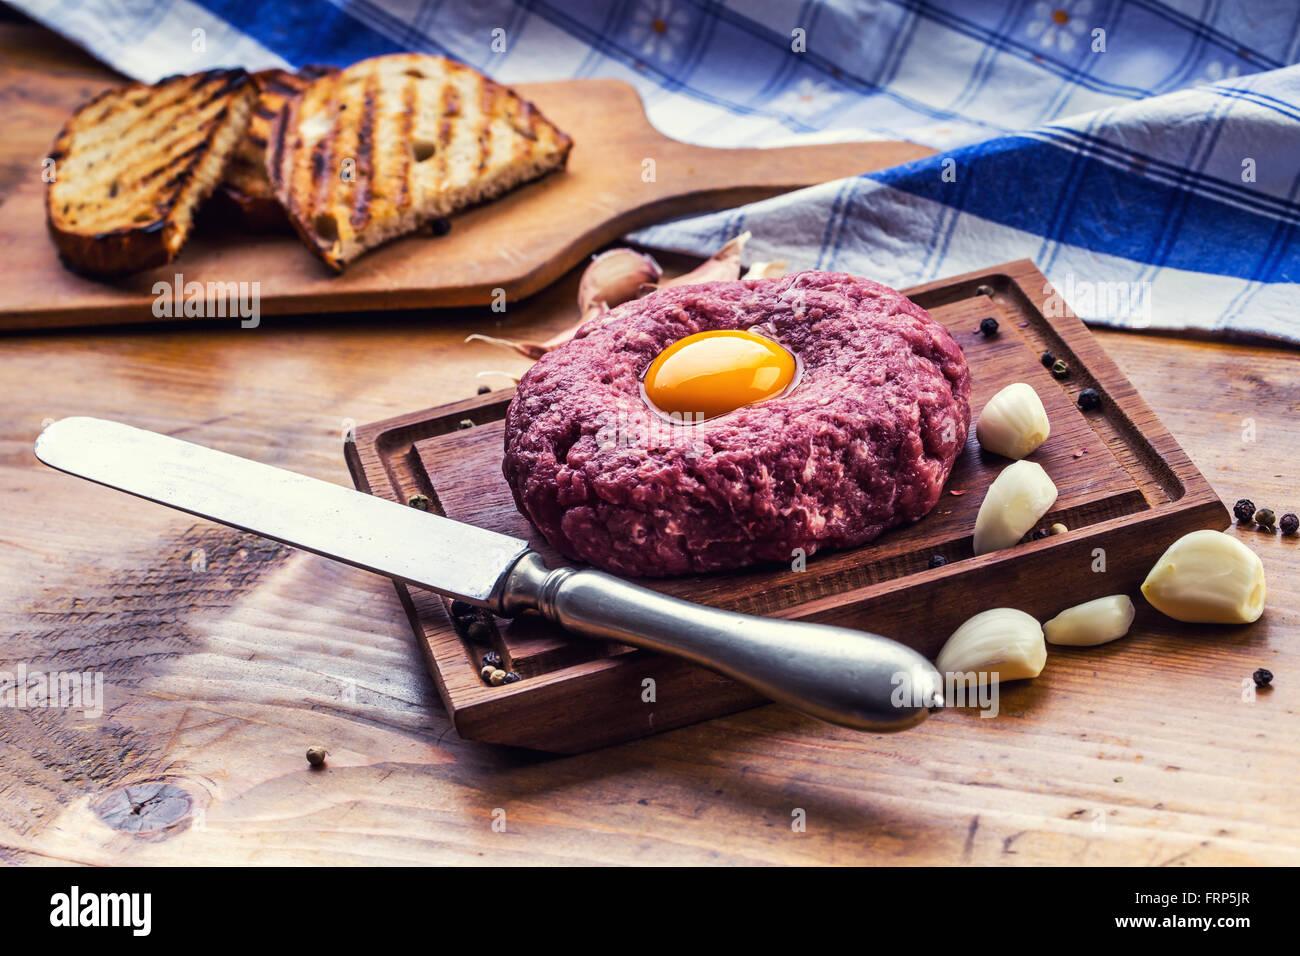 Raw beef .Tasty Steak tartare. Classic steak tartare on wooden board. Ingredients: Raw beef meat salt pepper egg - Stock Image